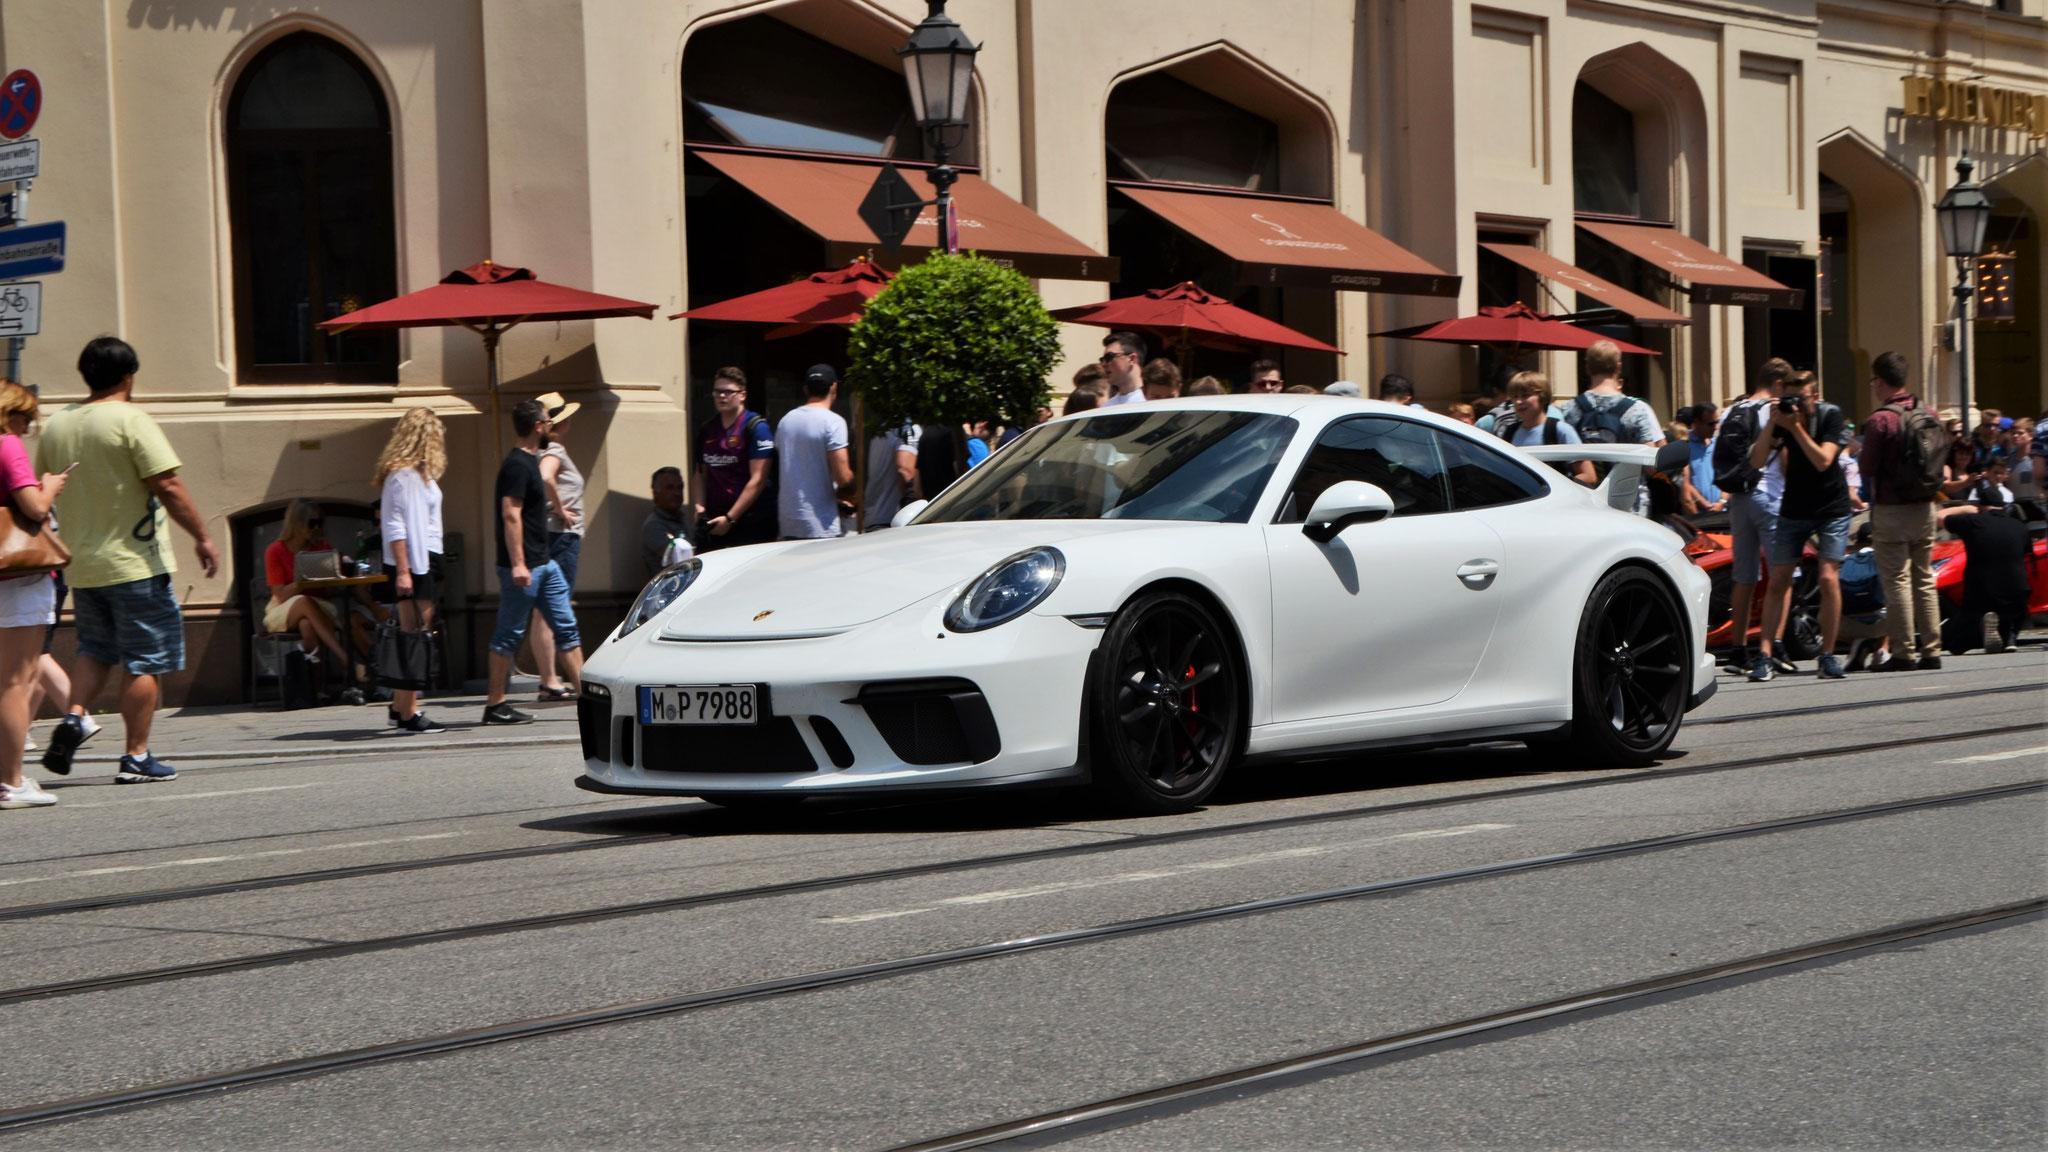 Porsche 991 GT3 - M-P-7988